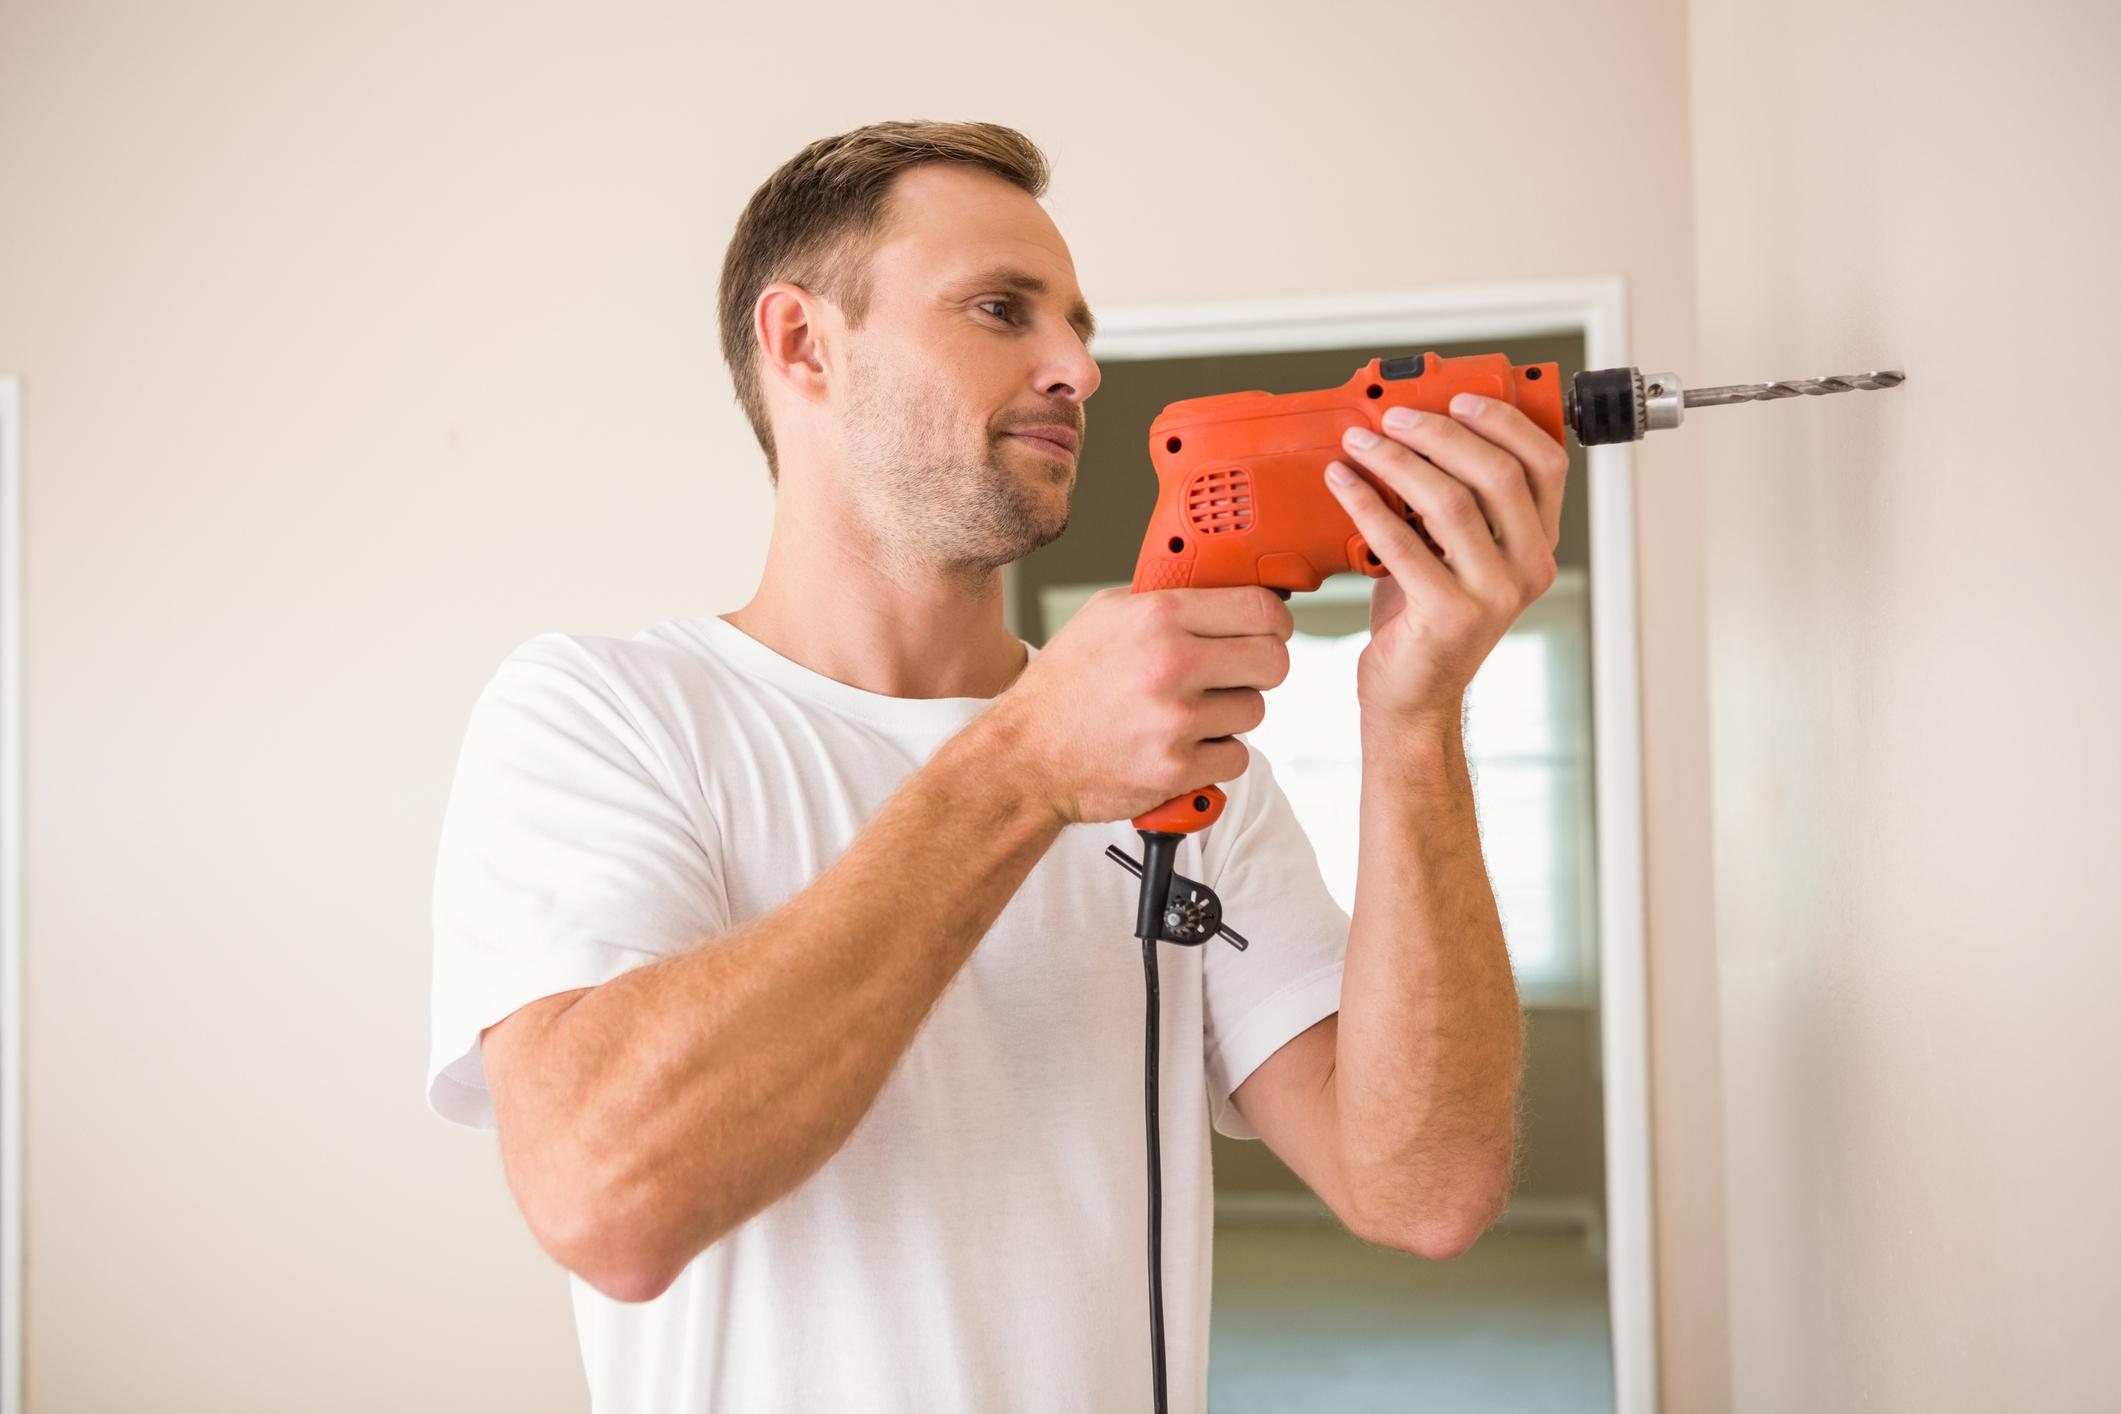 Man using power drill.